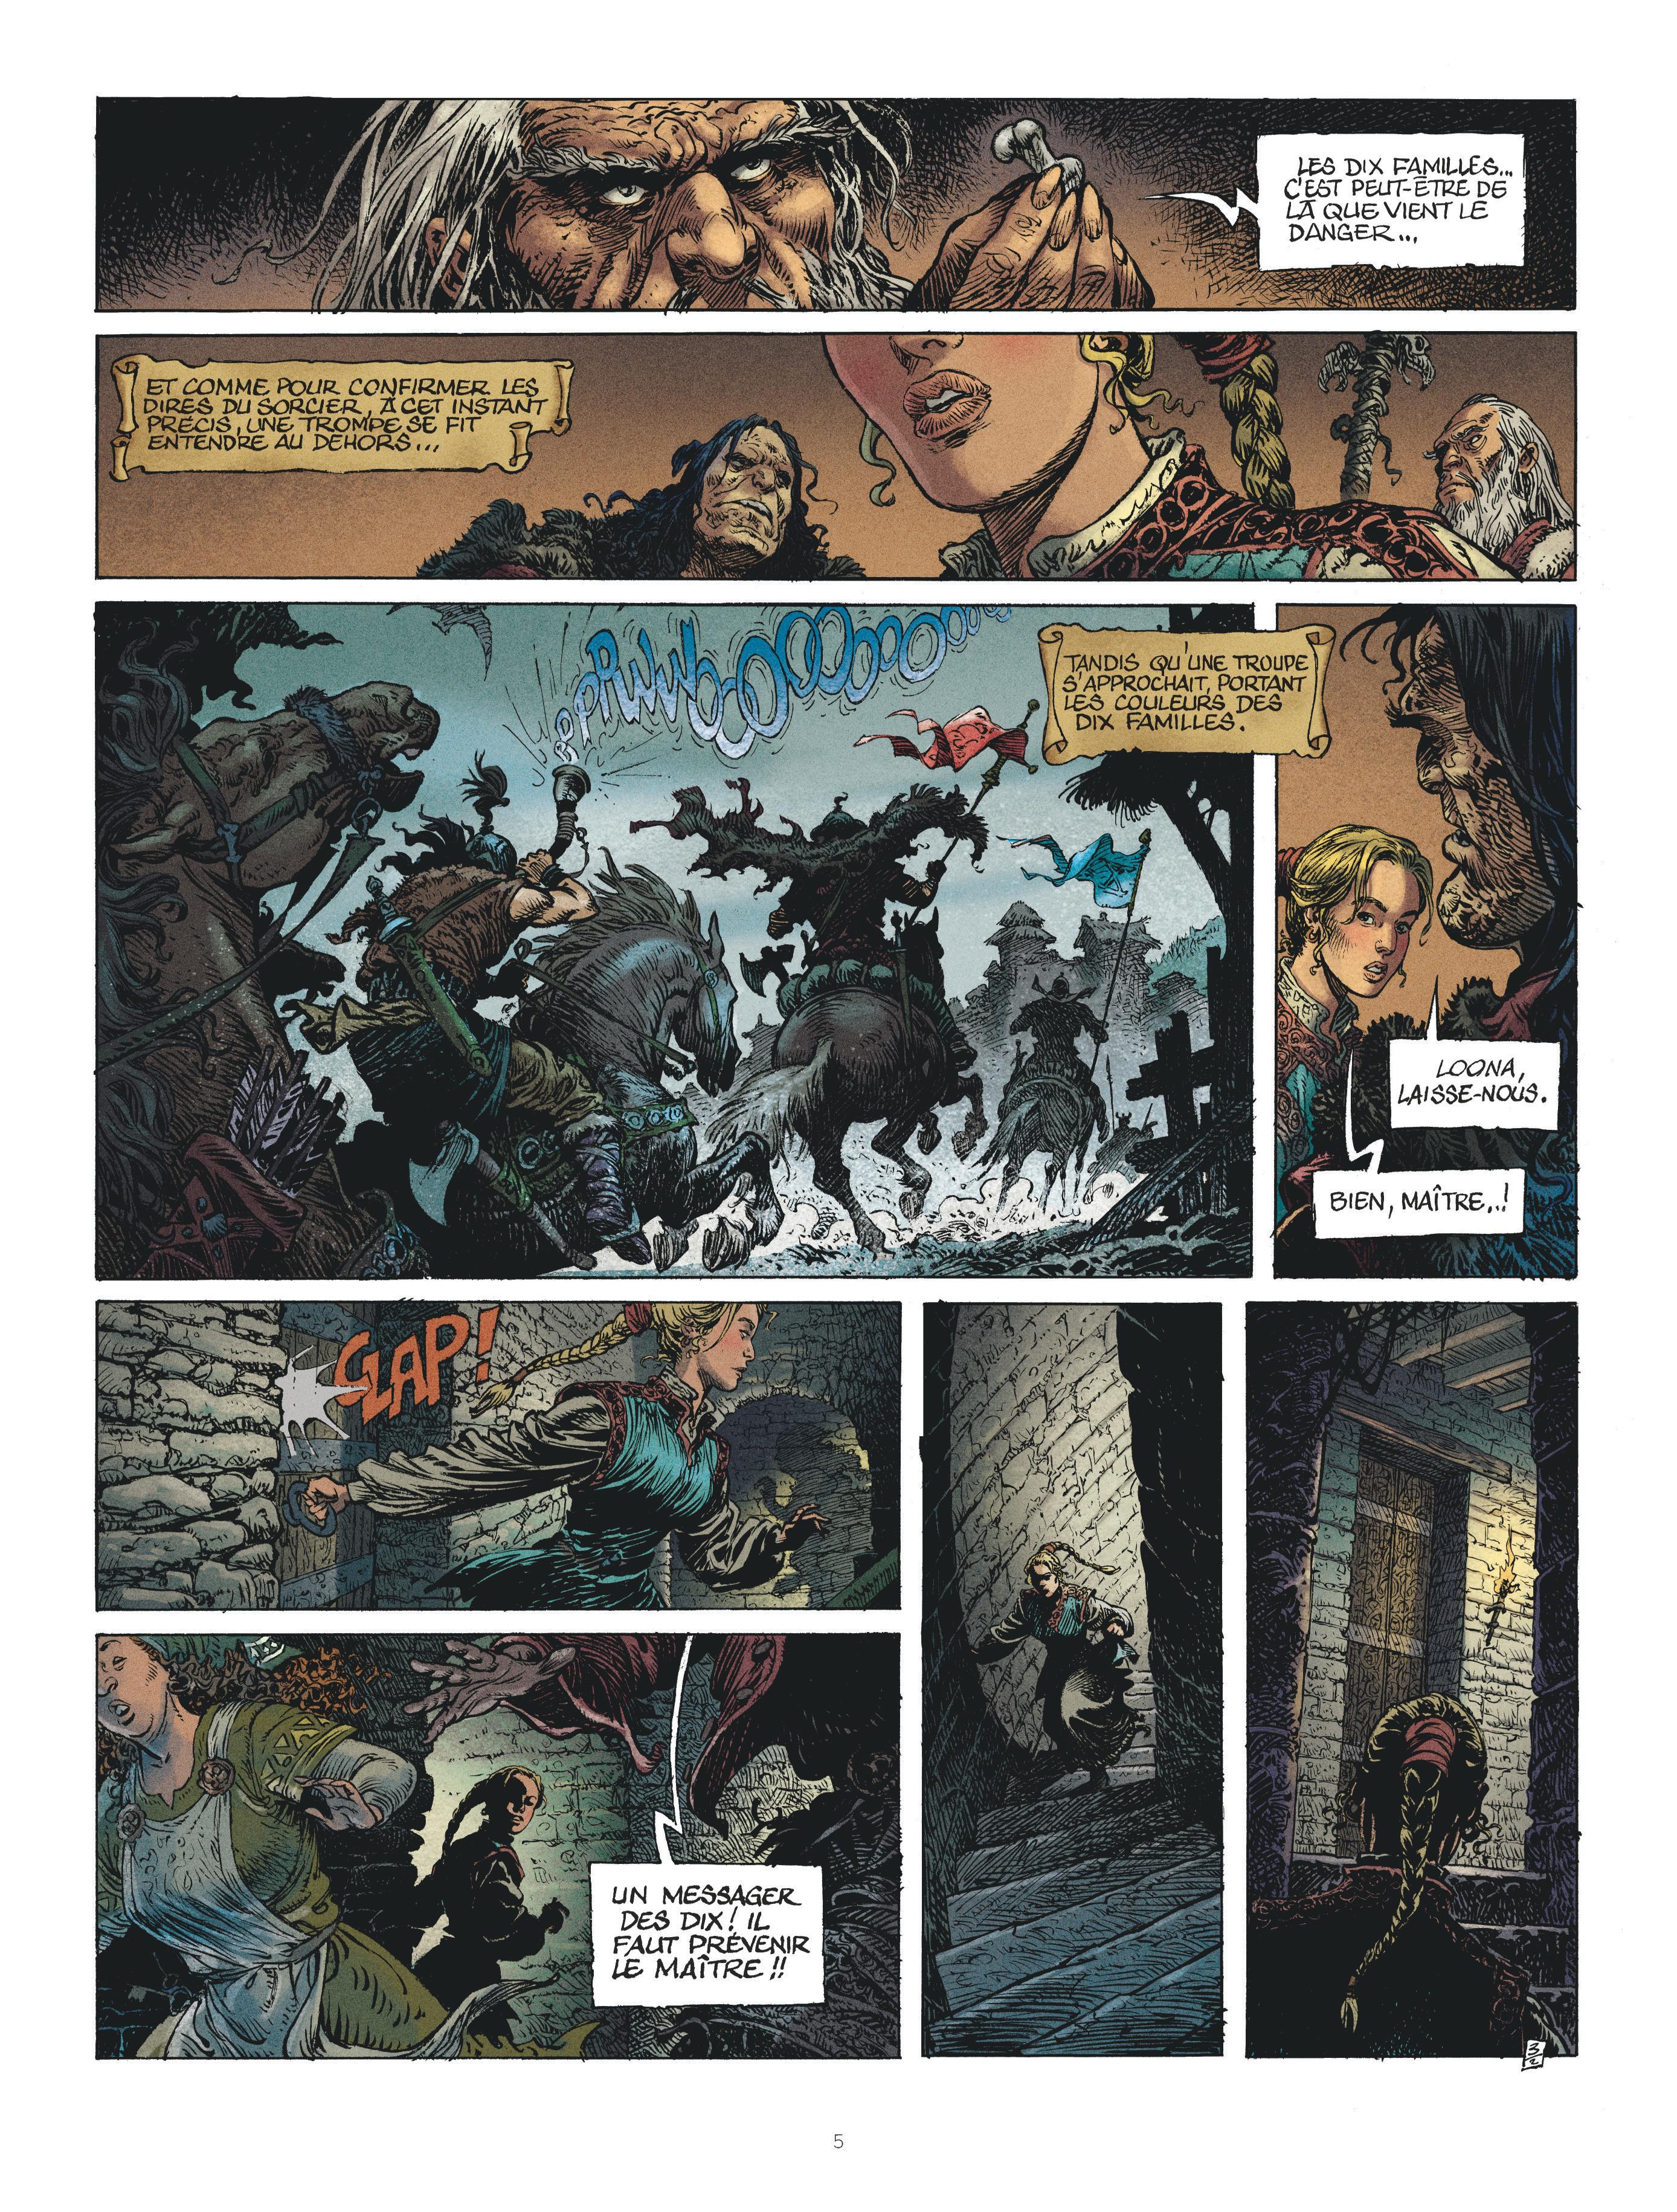 saga_valta#2_Page 5